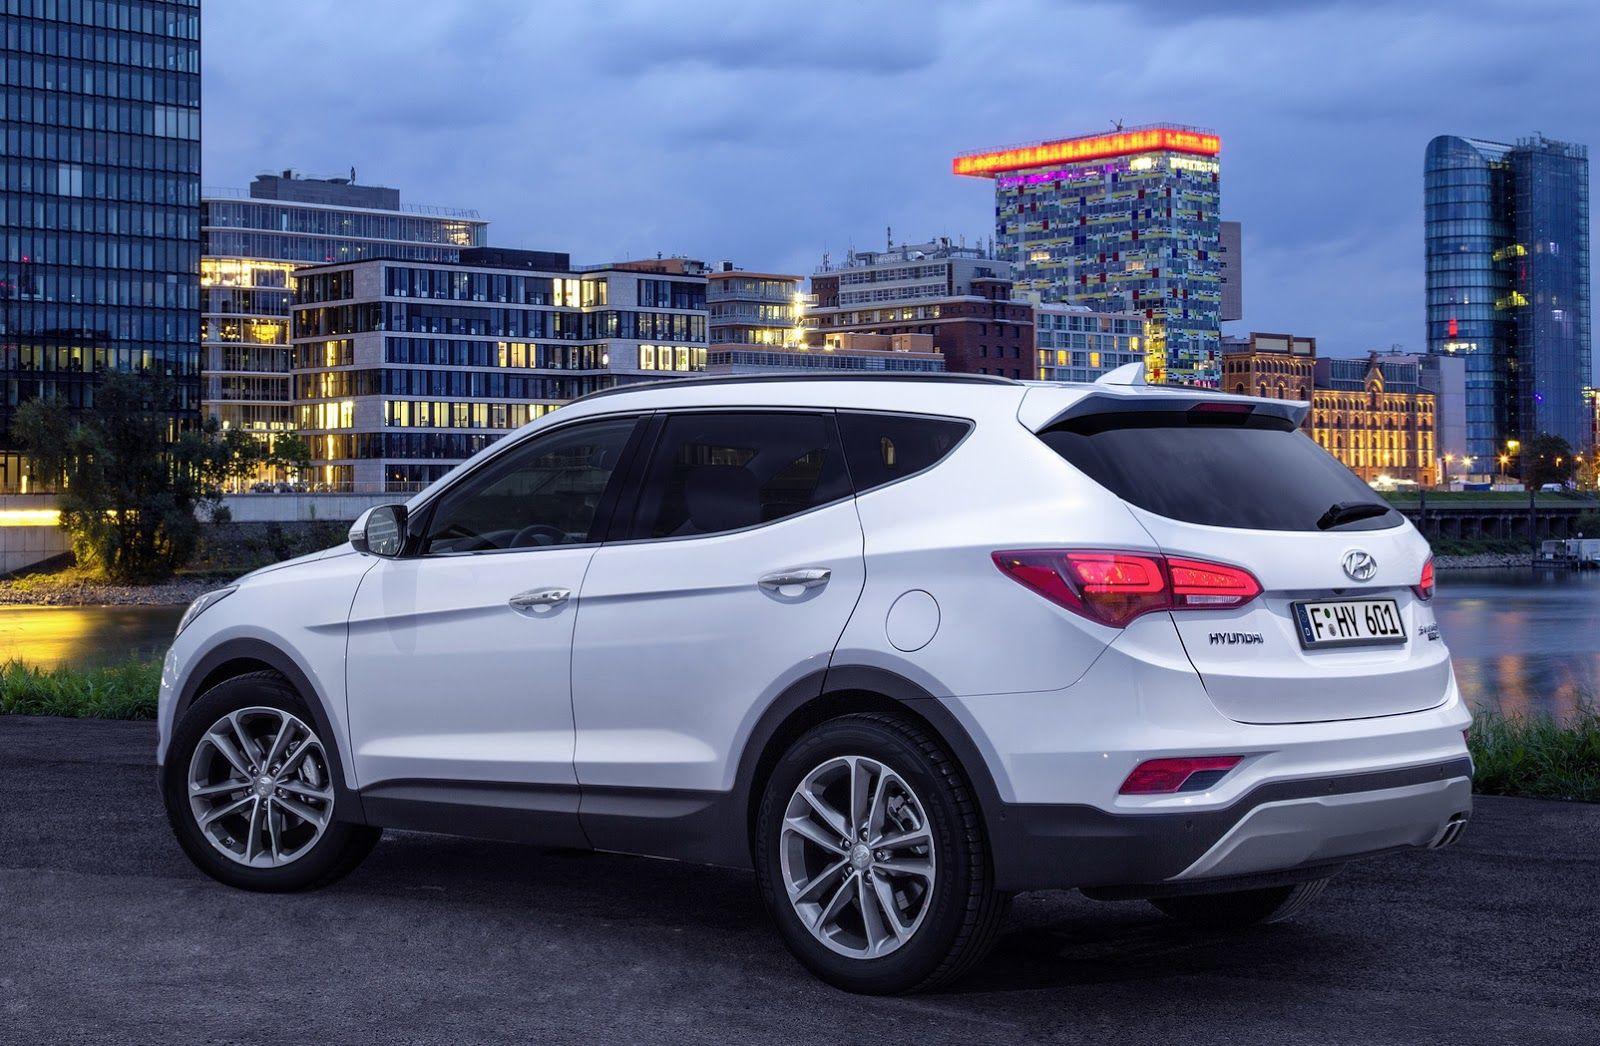 Facelifted 2017 Hyundai Santa Fe Unveiled Debuts In Frankfurt